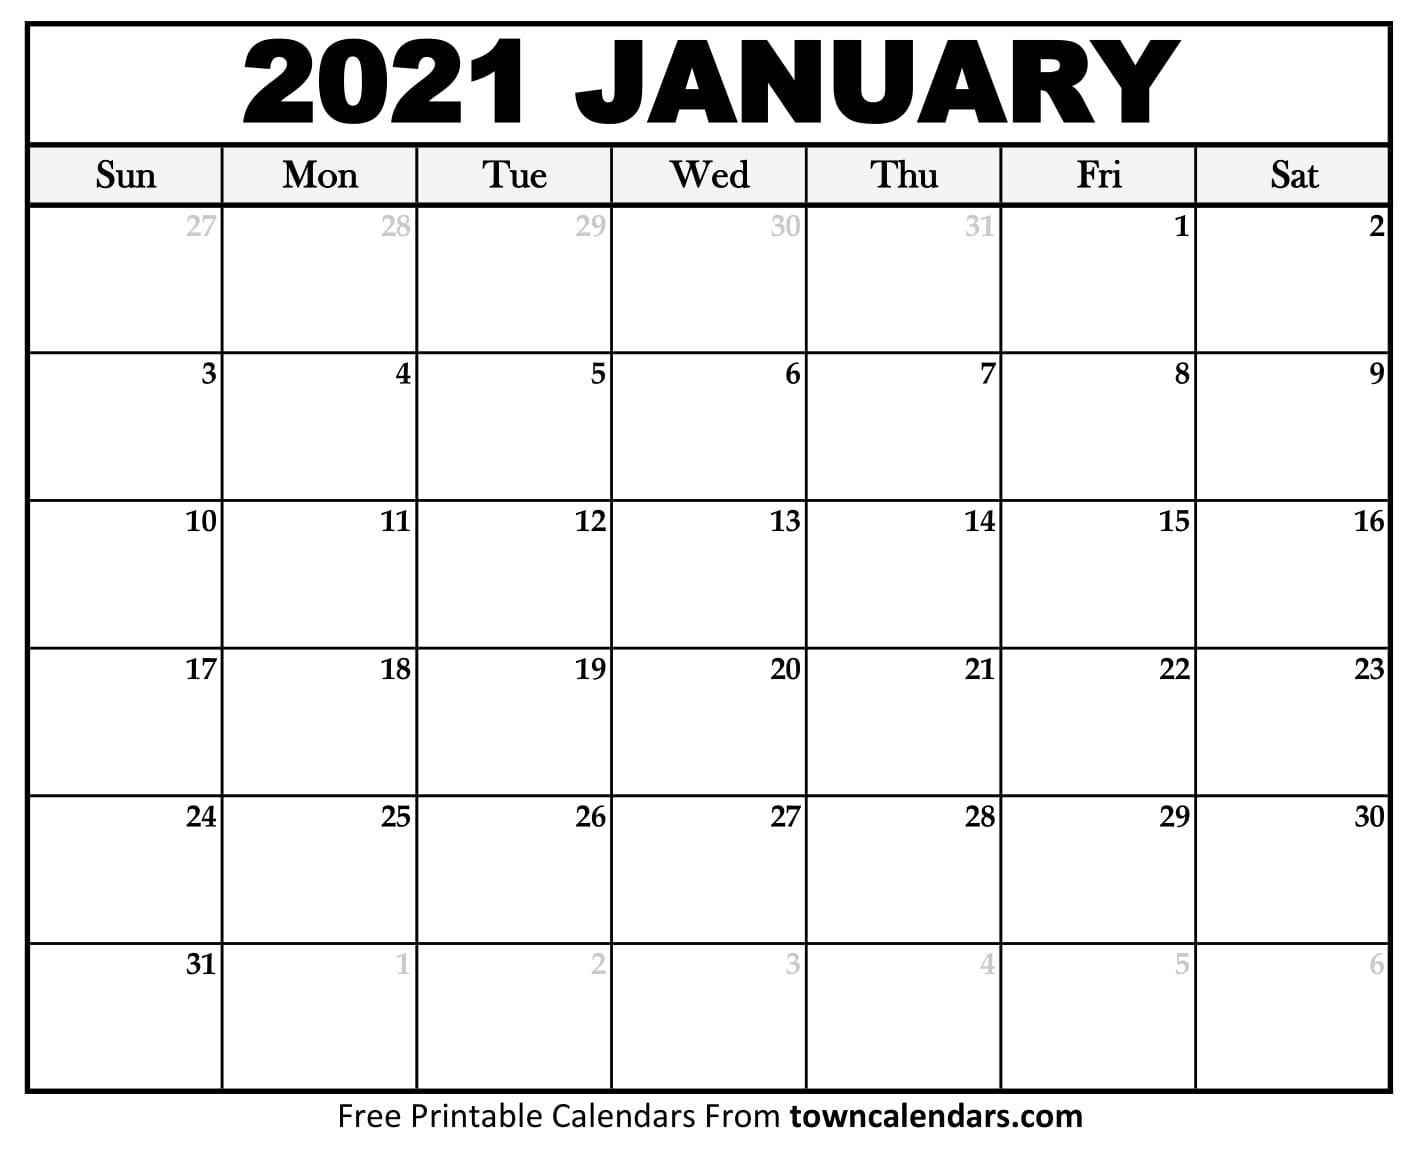 Printable January 2021 Calendar - Towncalendars  Calendar 2021 With Gregorian Dates